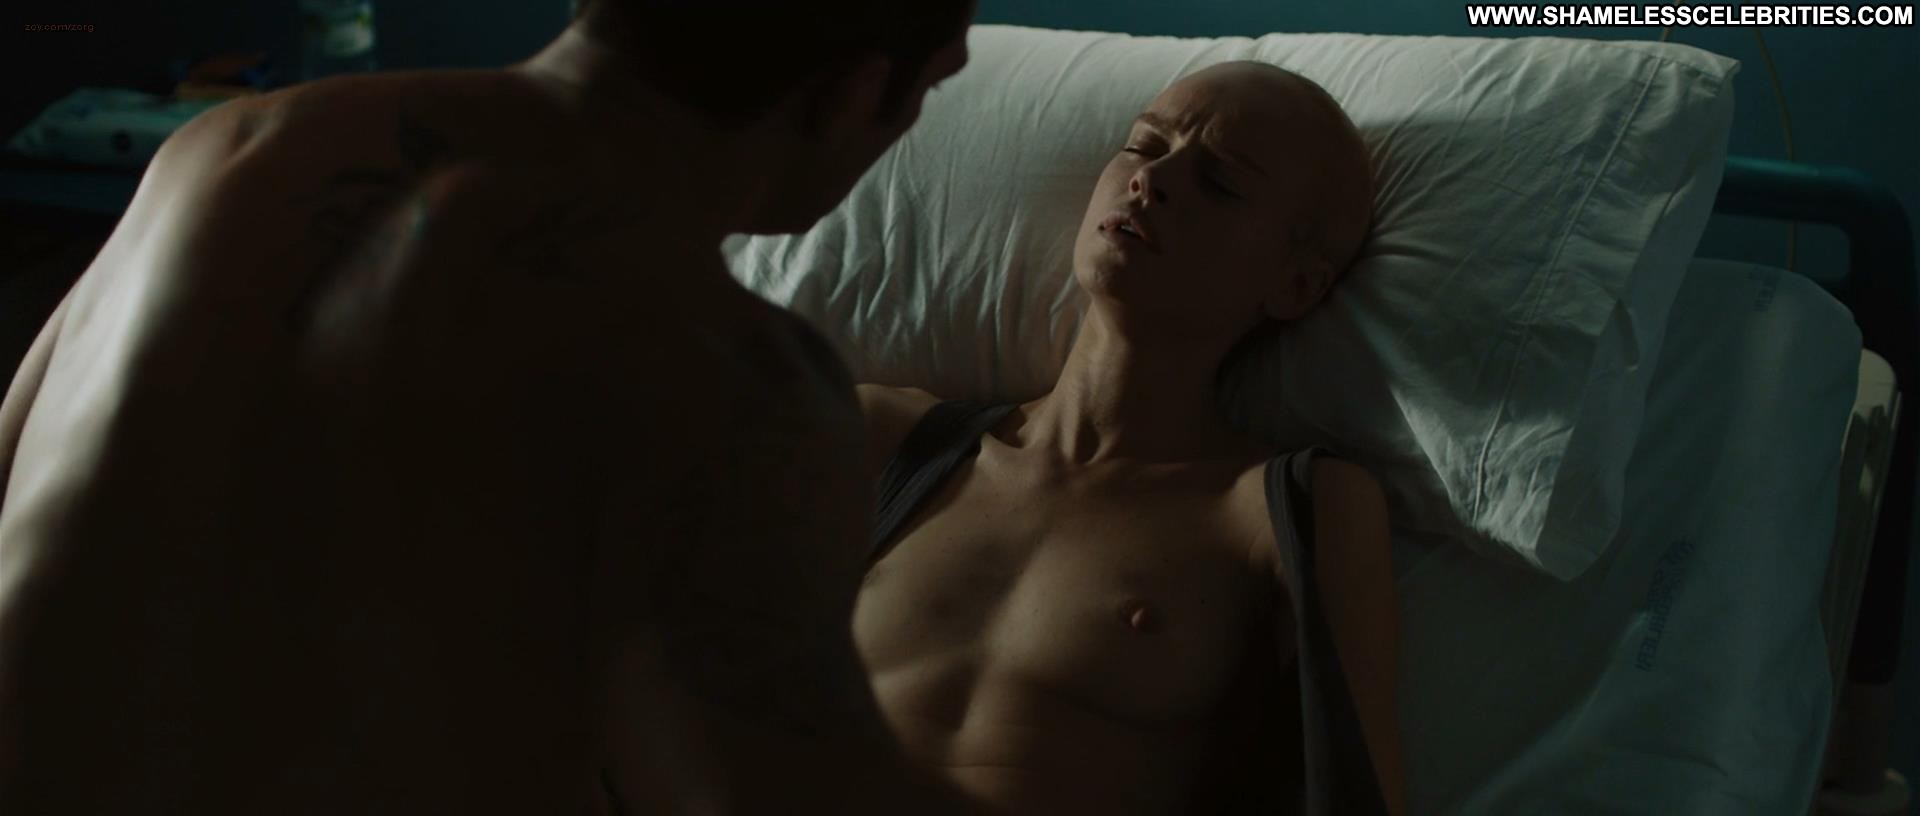 body heather thomas nude